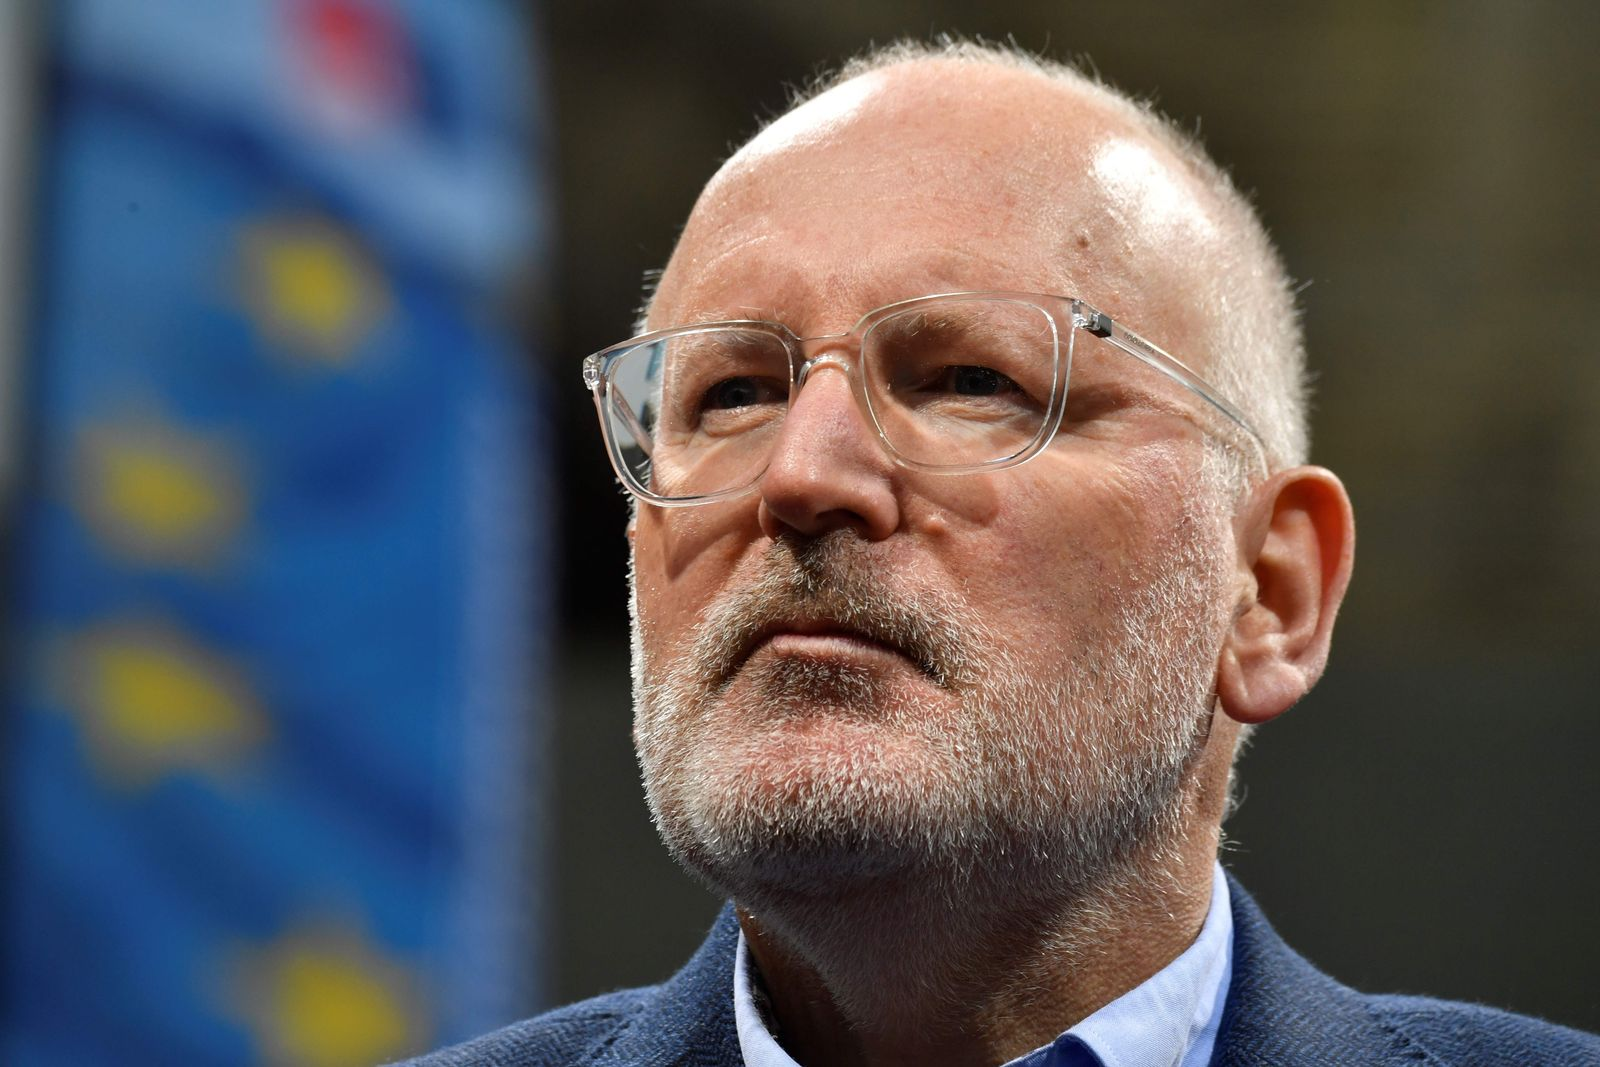 GERMANY-EU-POLITICS-VOTE